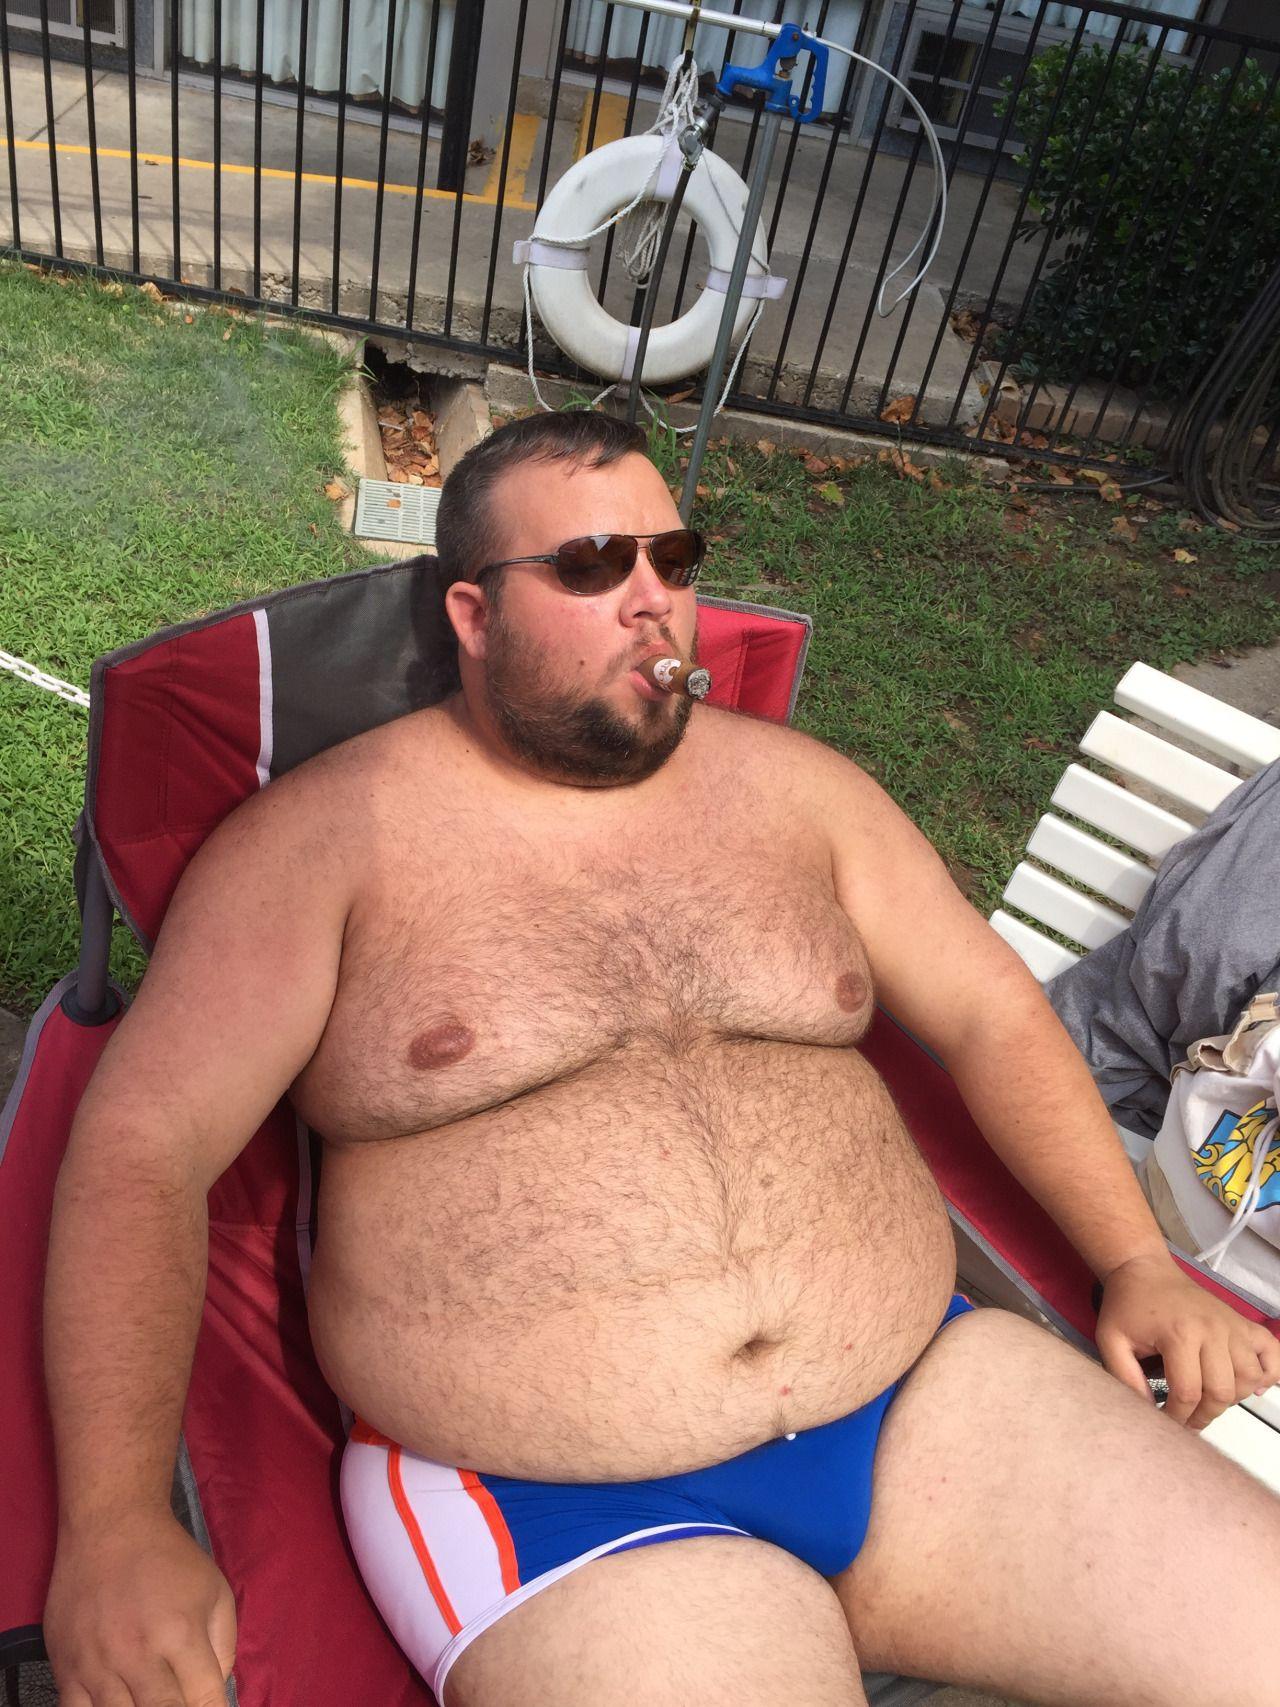 chubby-men-place-teen